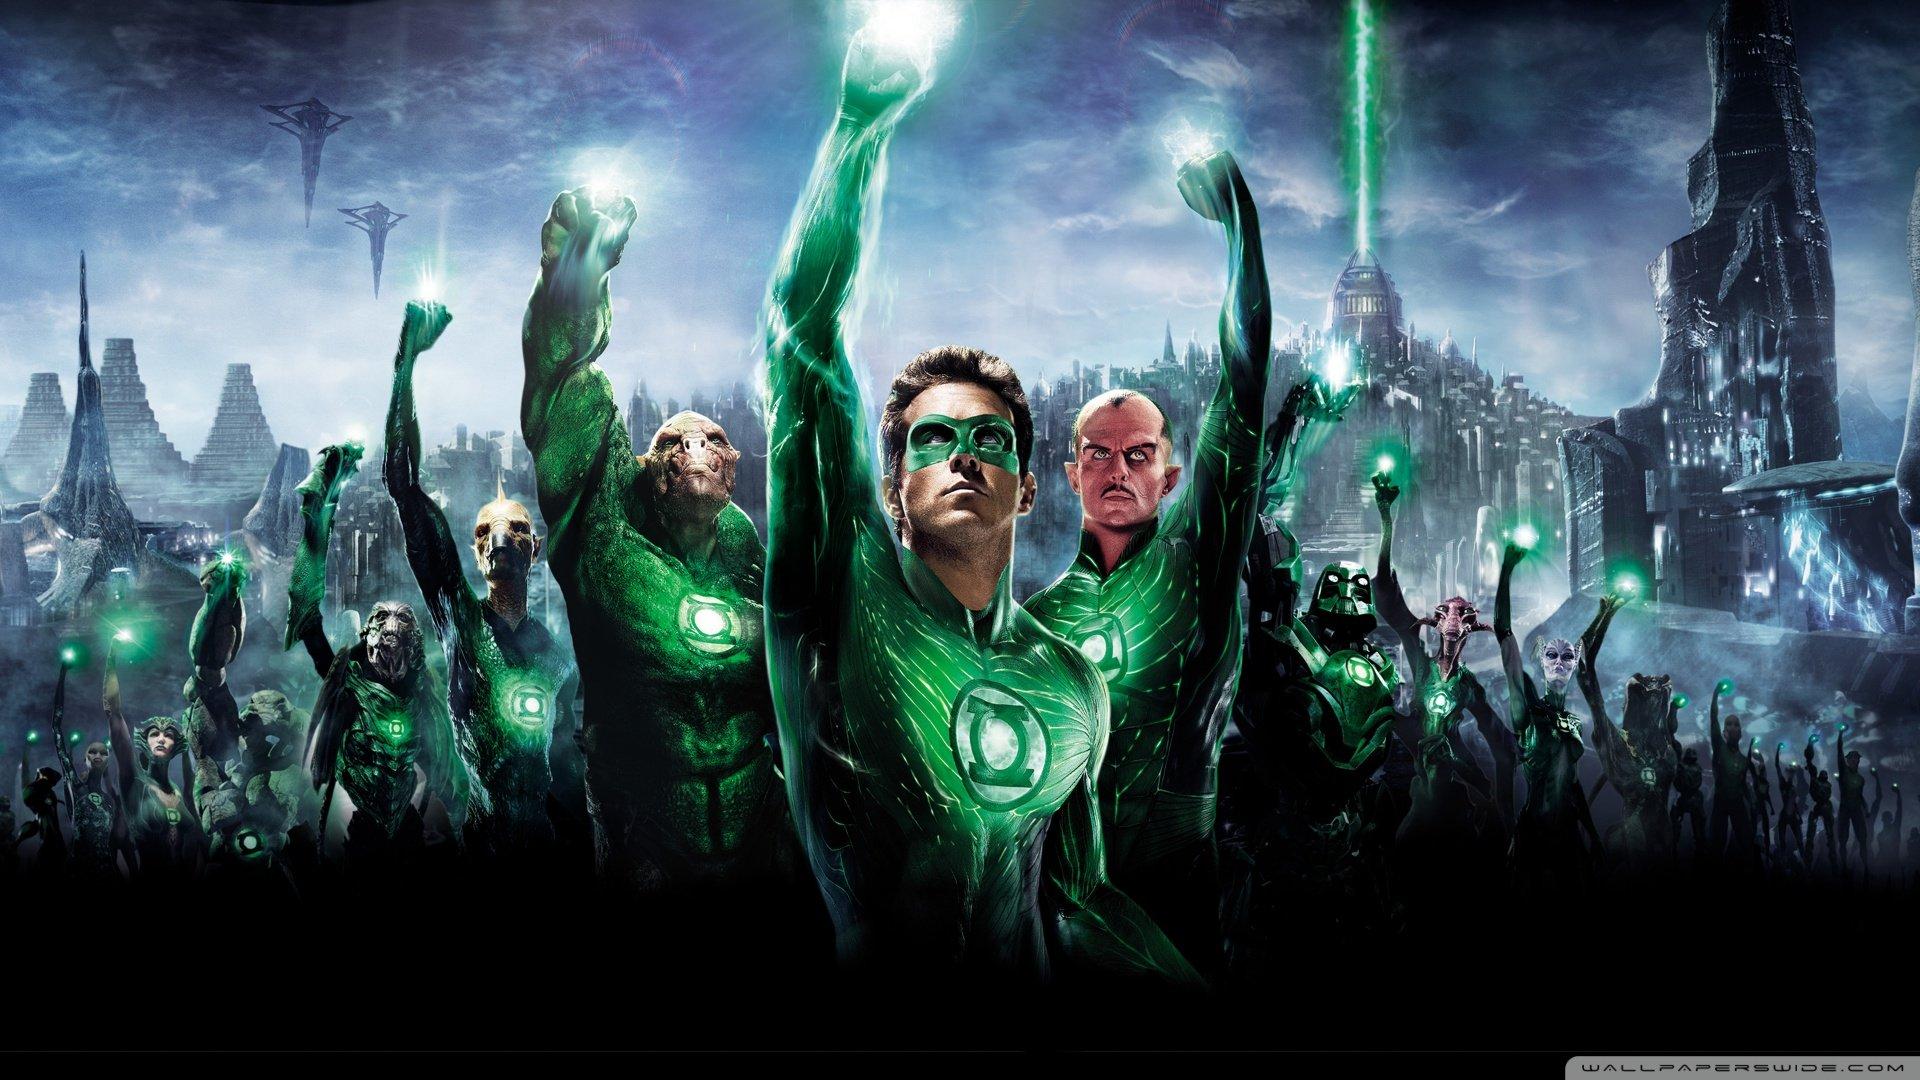 Green Lantern Movie 2011 4K HD Desktop Wallpaper for 4K Ultra 1920x1080